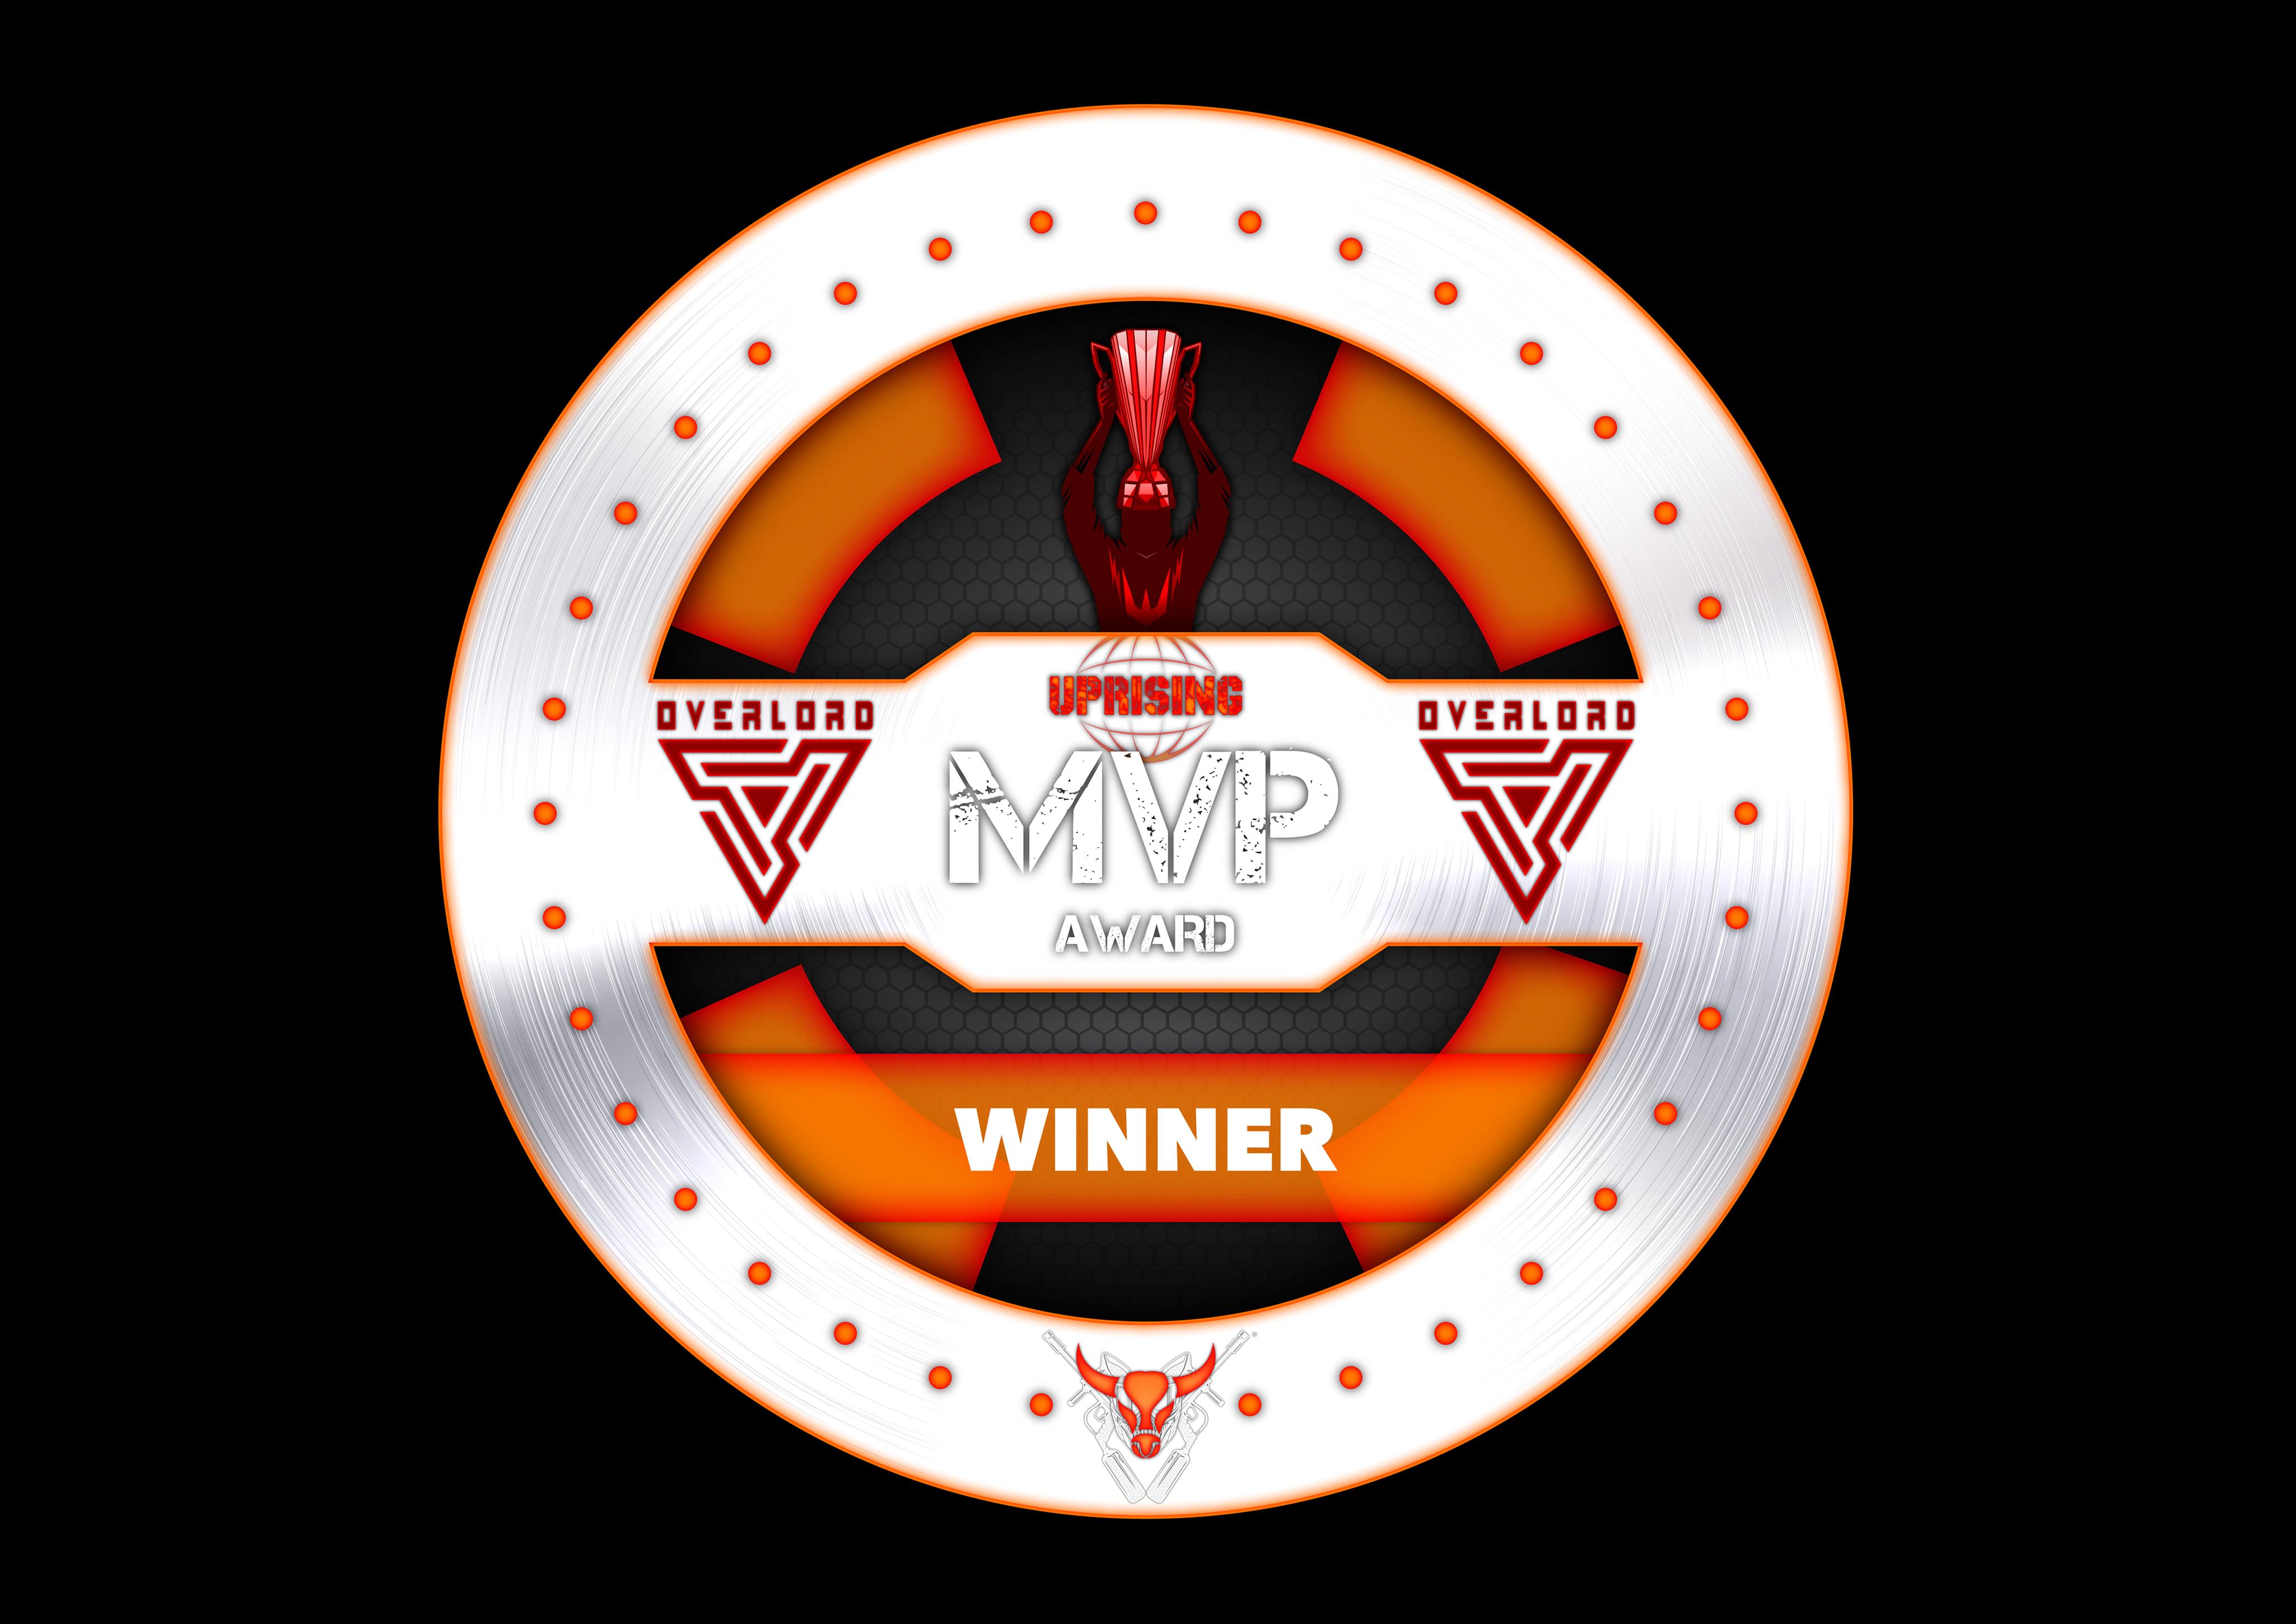 Overlord MVP Award